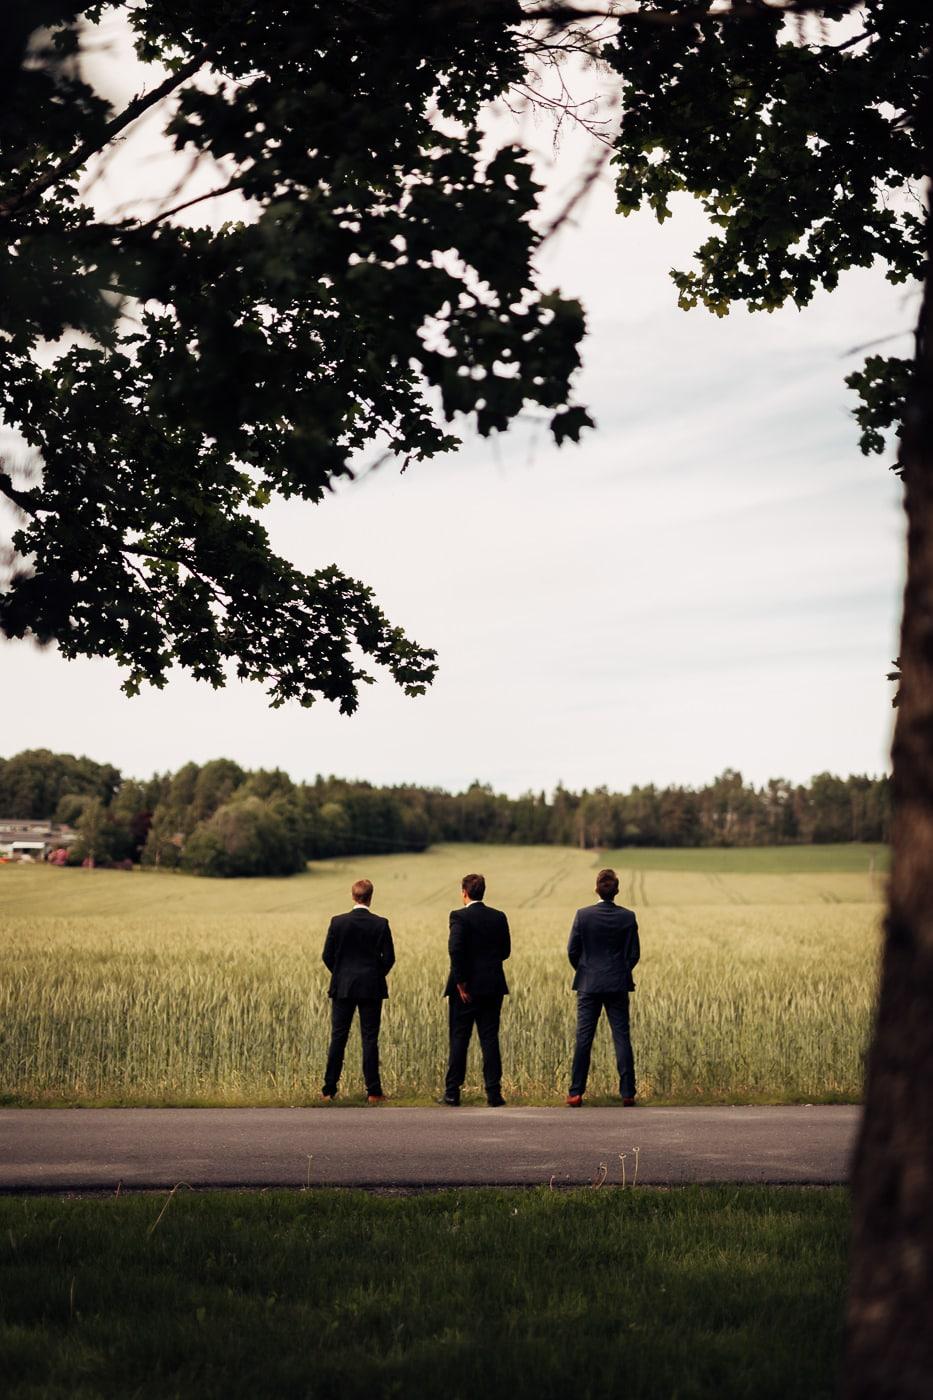 Karoline & Andreas - bryllup i Østfold med magiske detaljer Bryllup Fredrikstad Fotograf 49